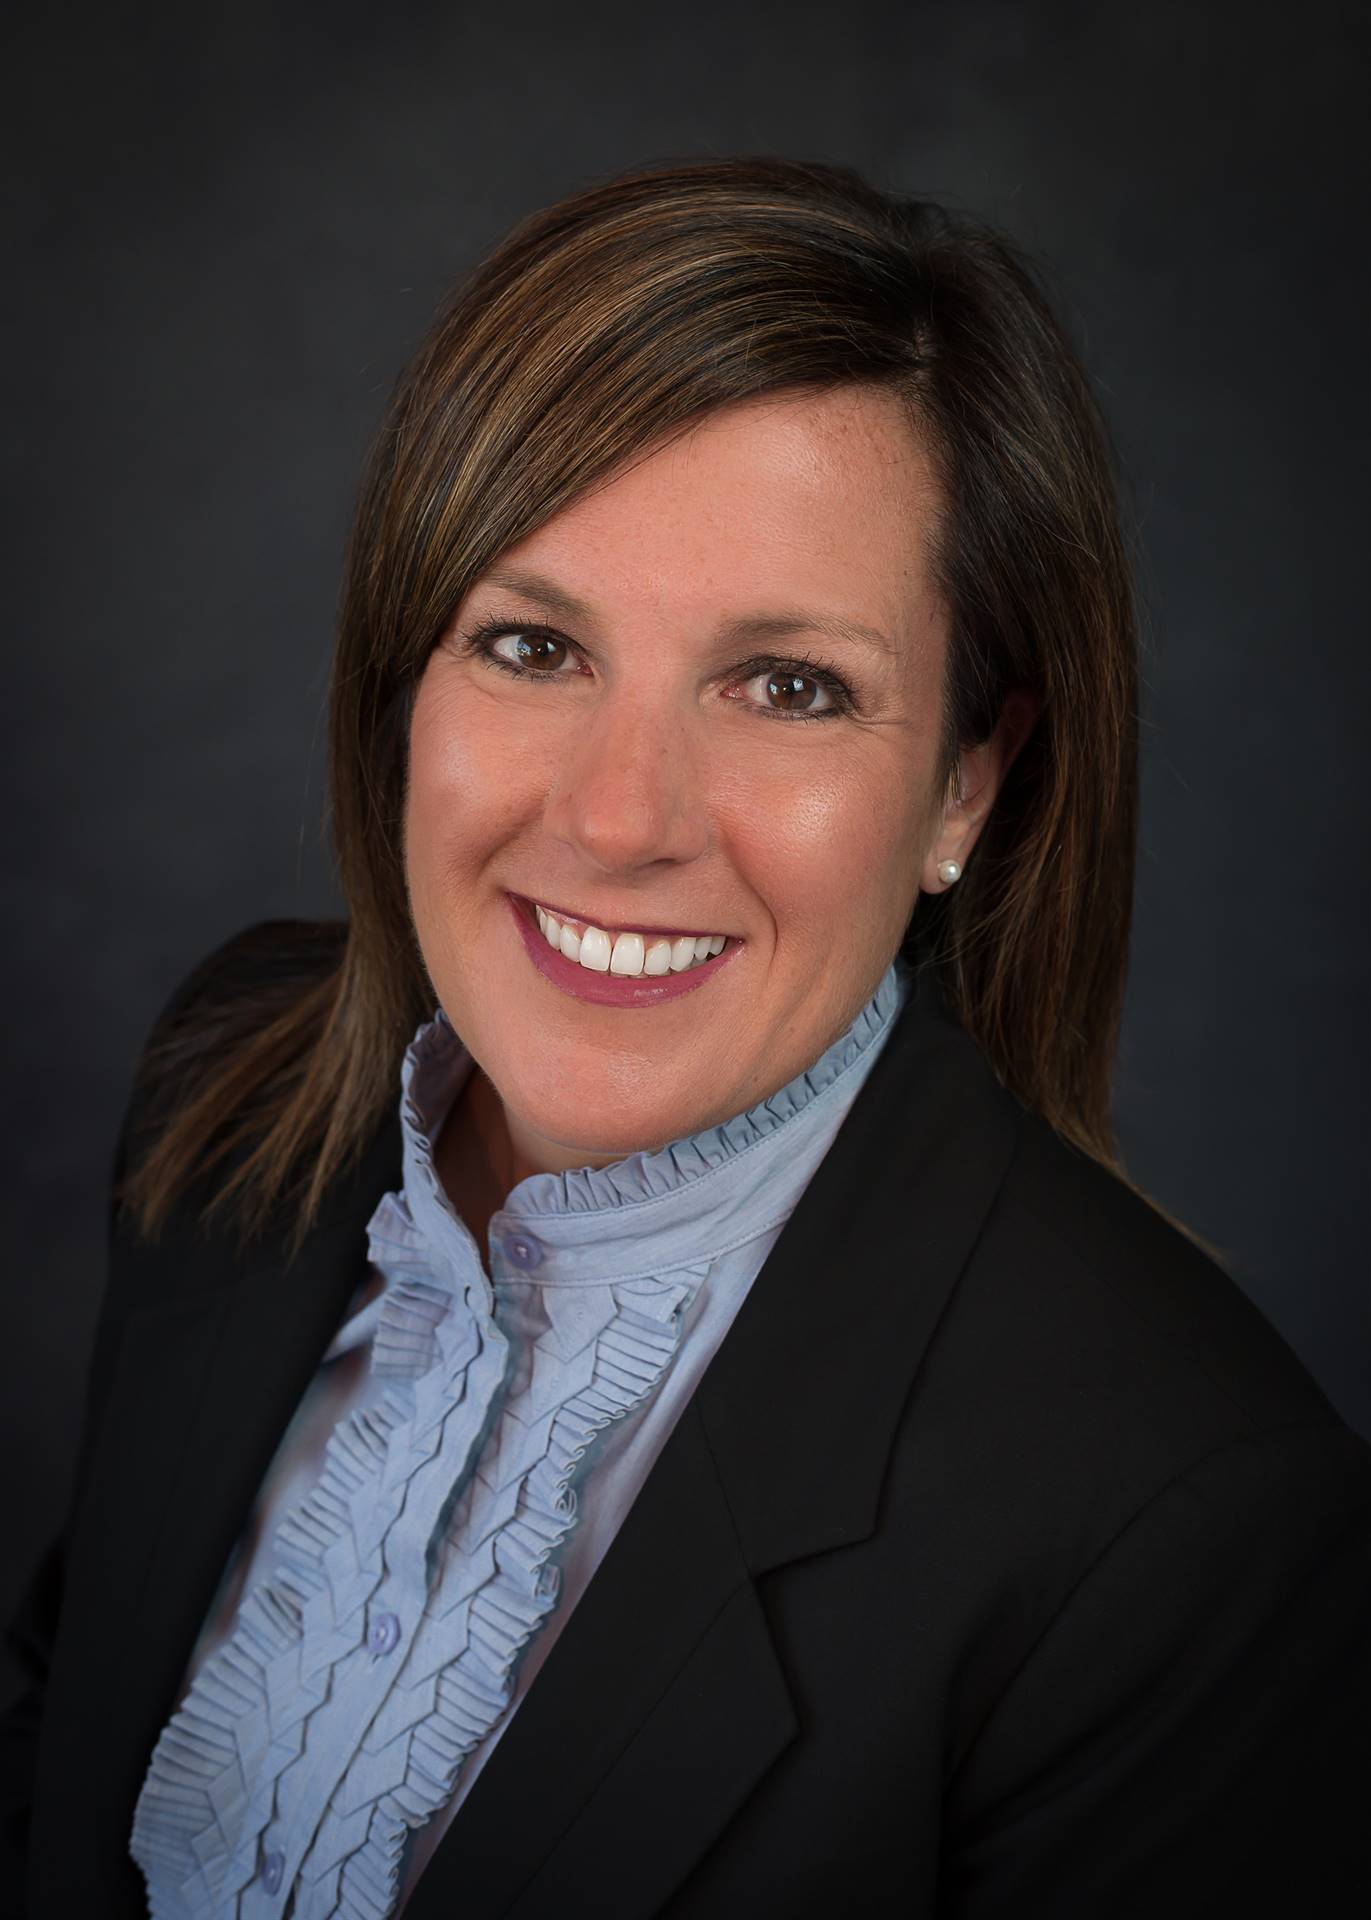 Julie Ramos